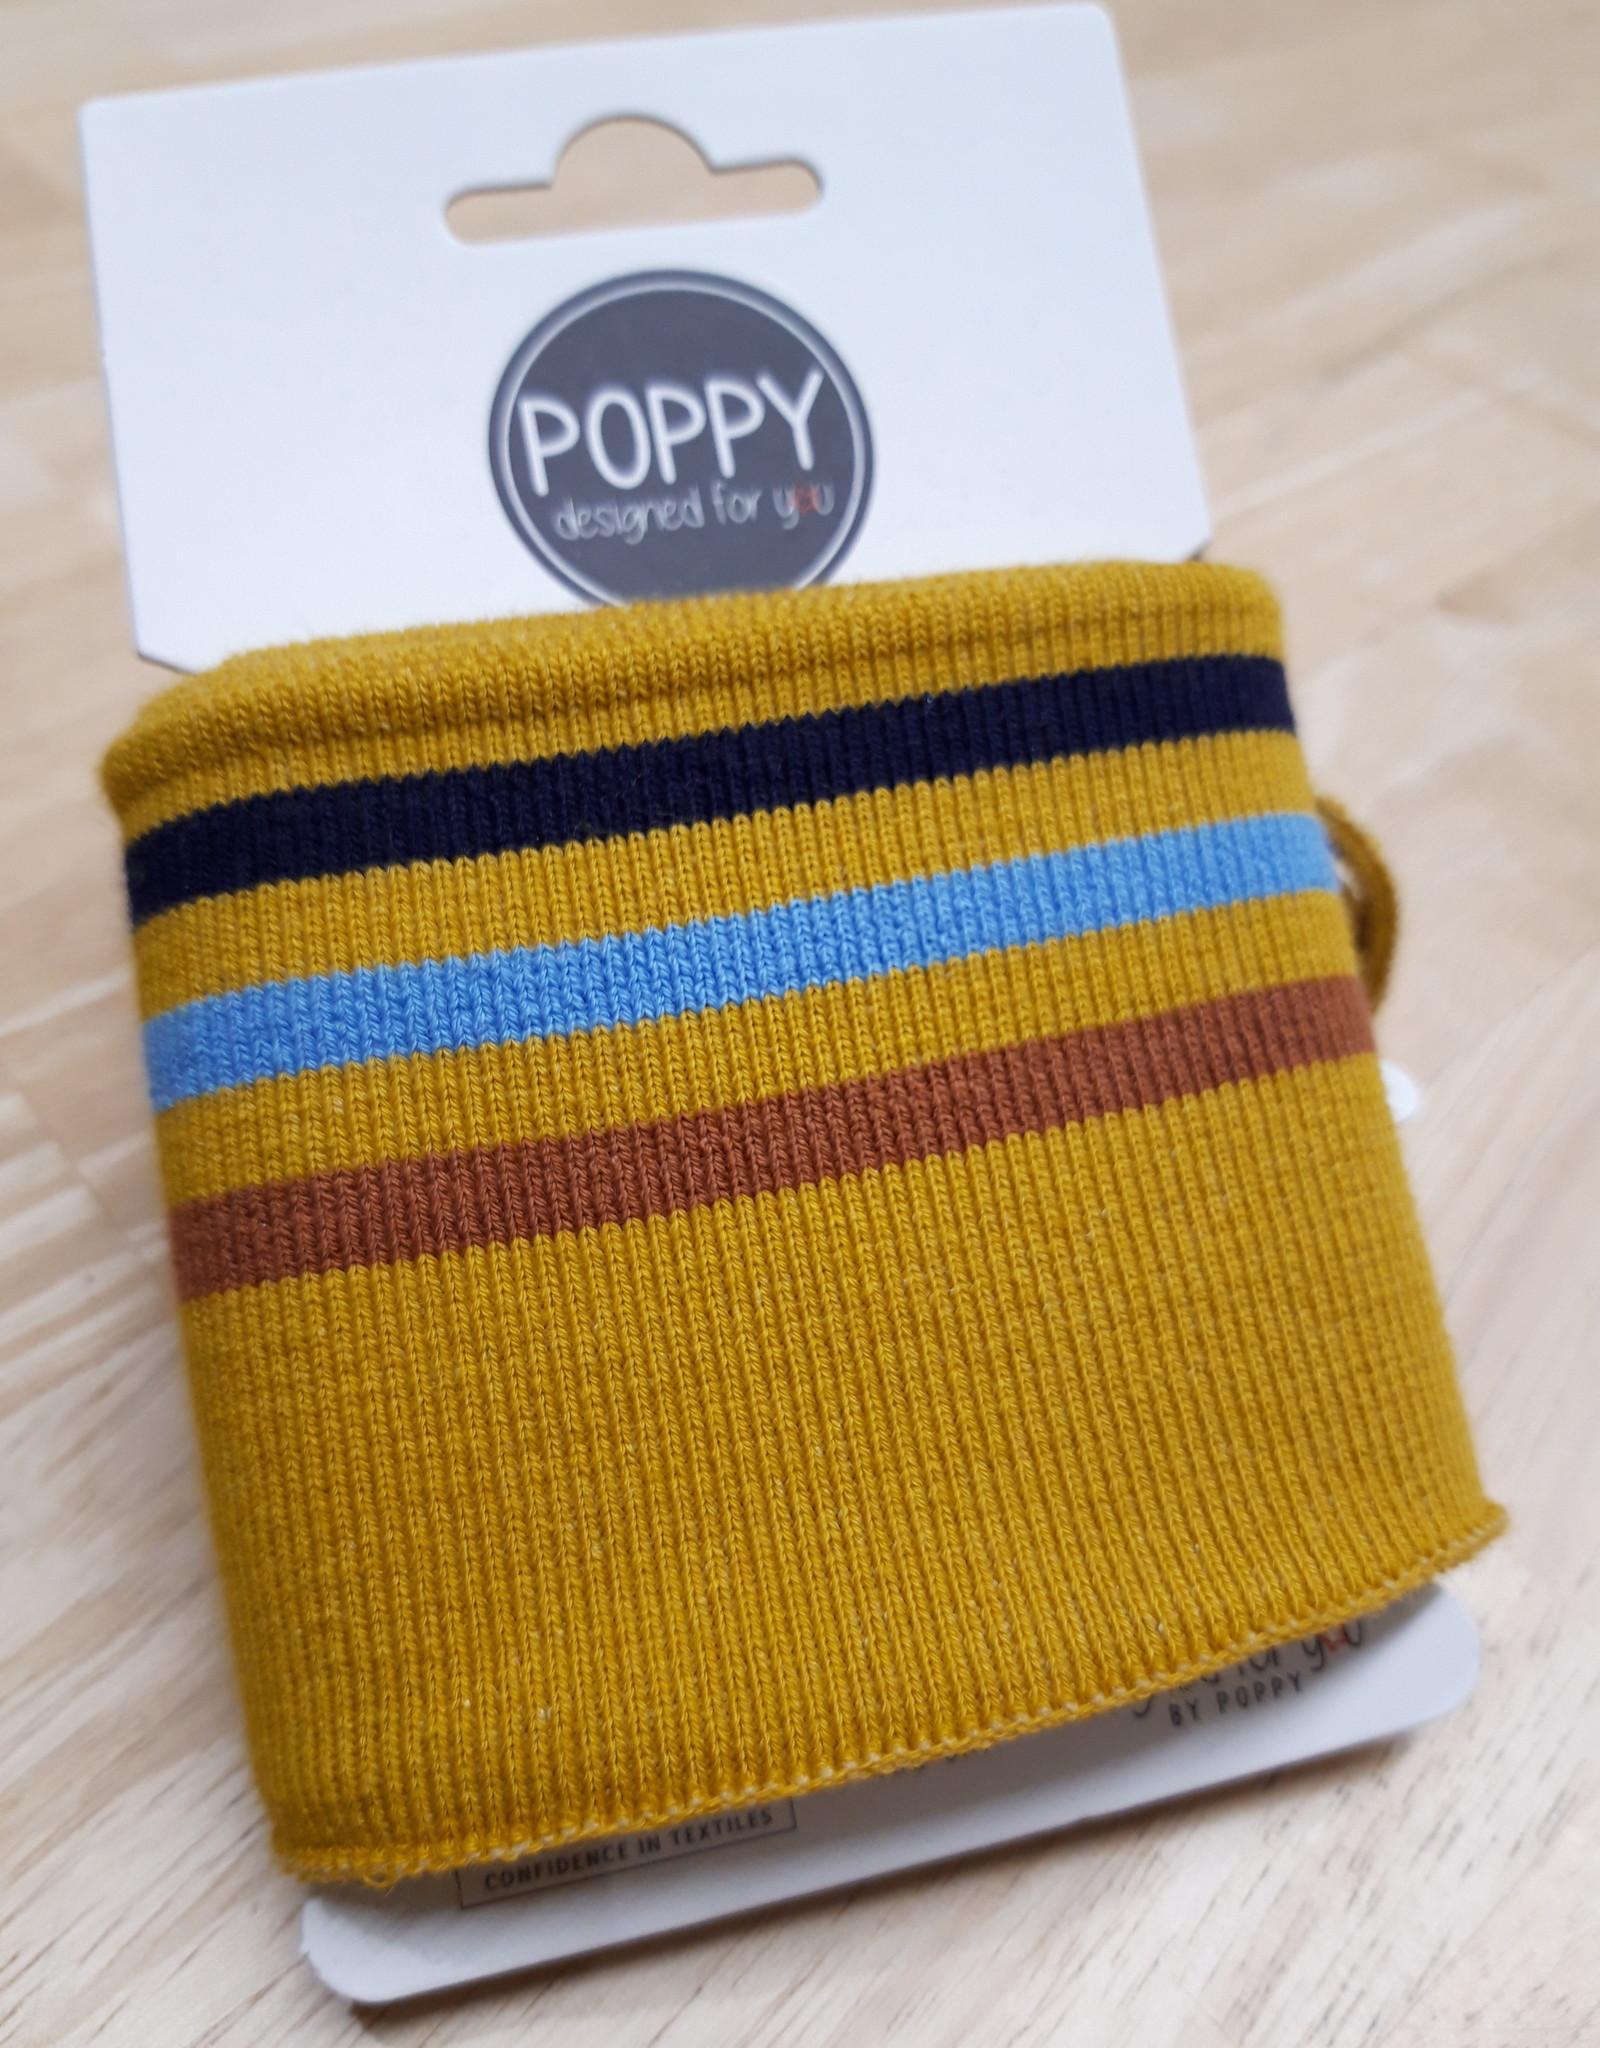 Poppy designed for you Cuff Oker/roest/blauw/navy - Poppy